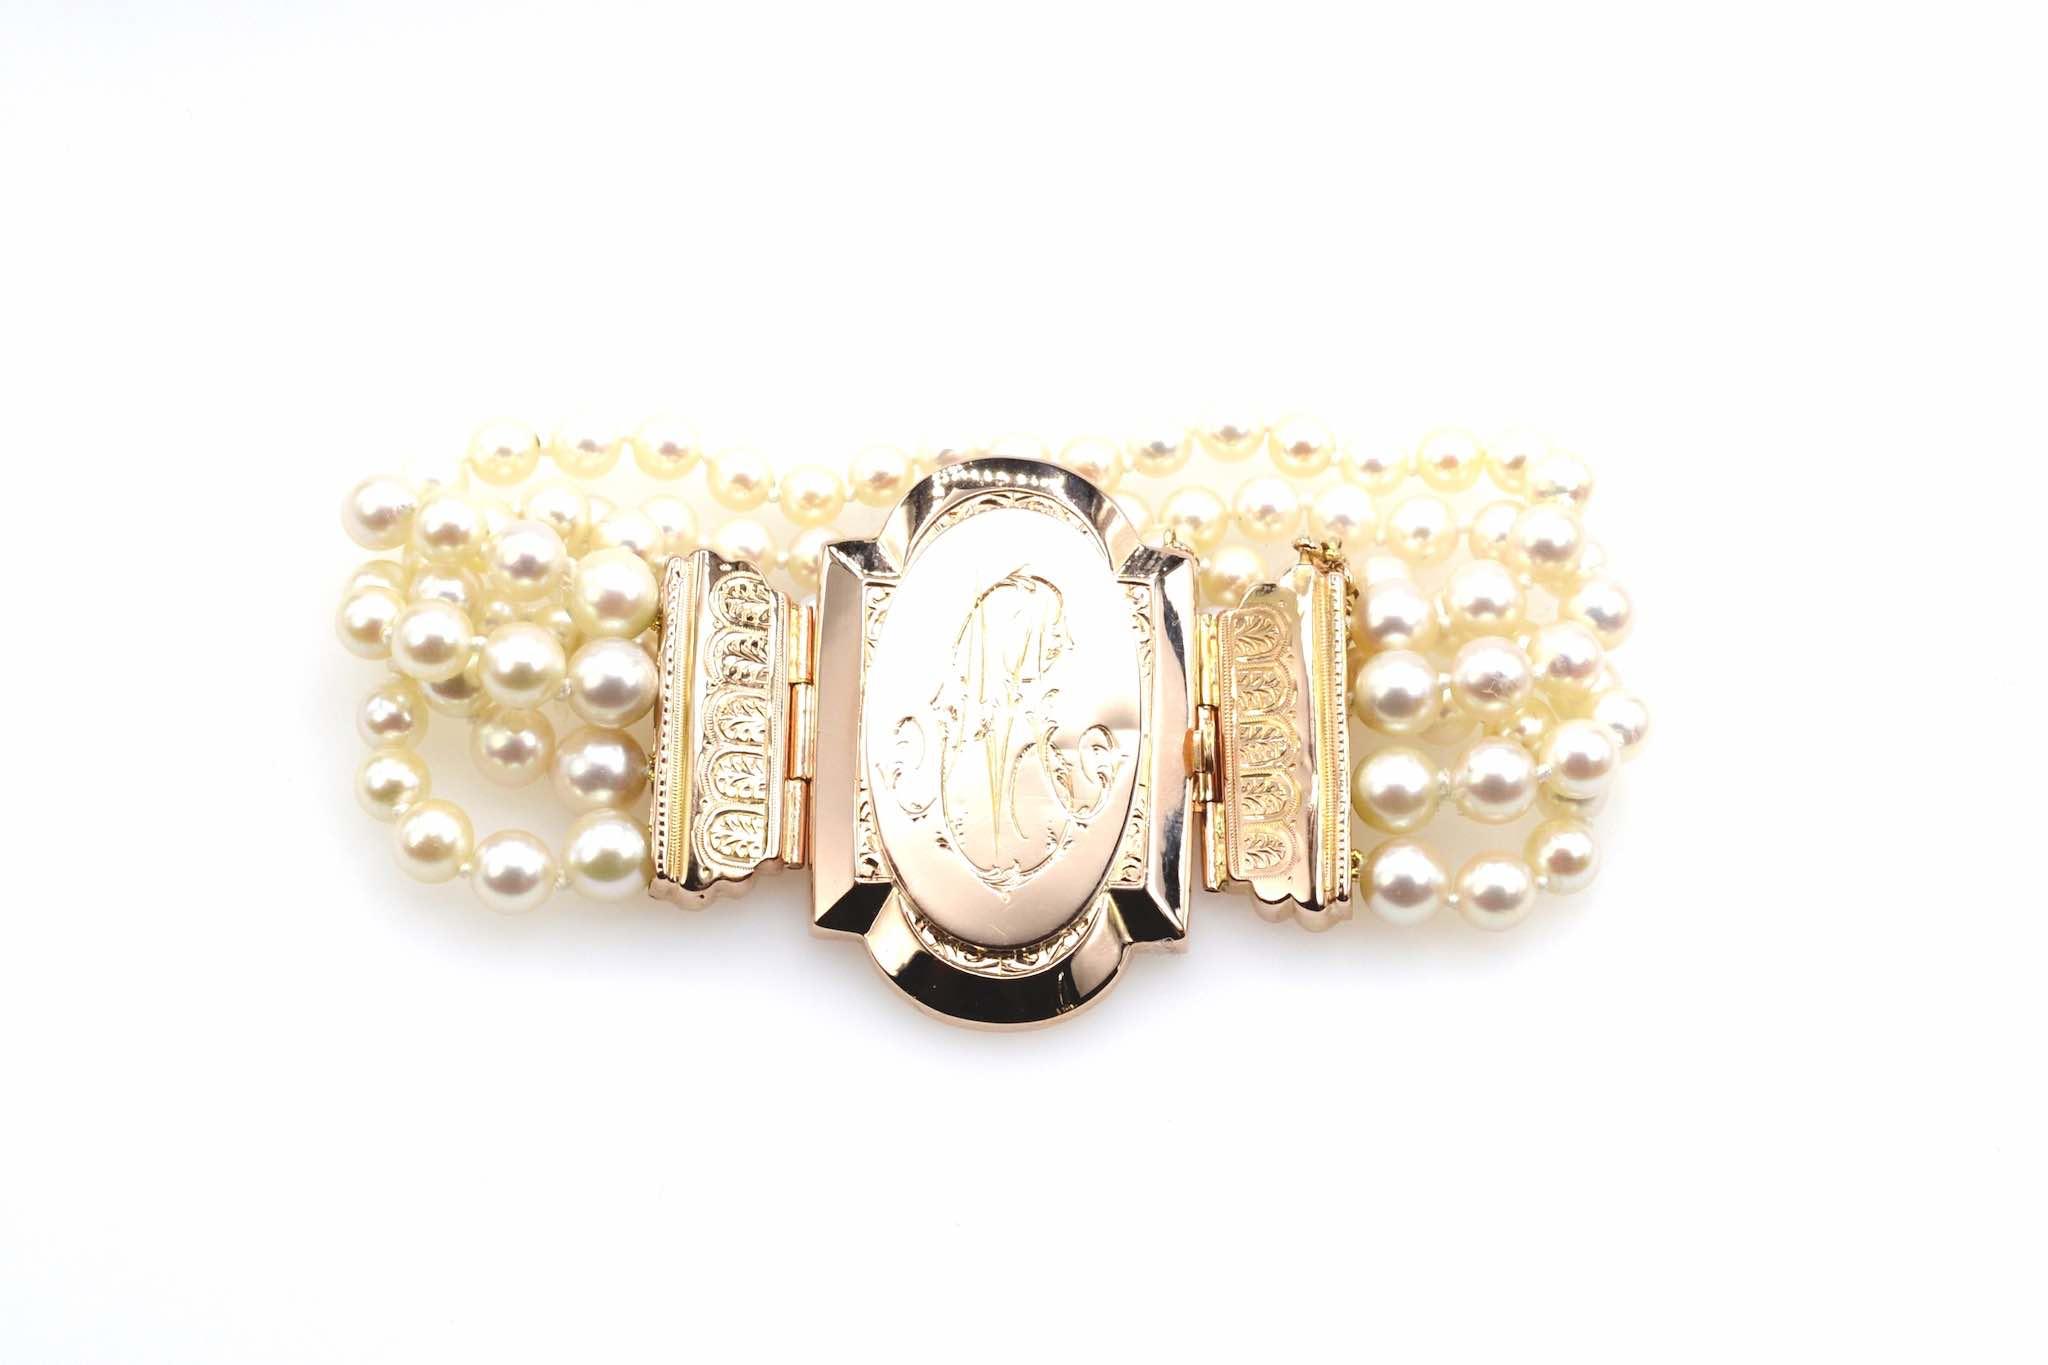 Bracelet 3 rangs de perles et fermoir ancien